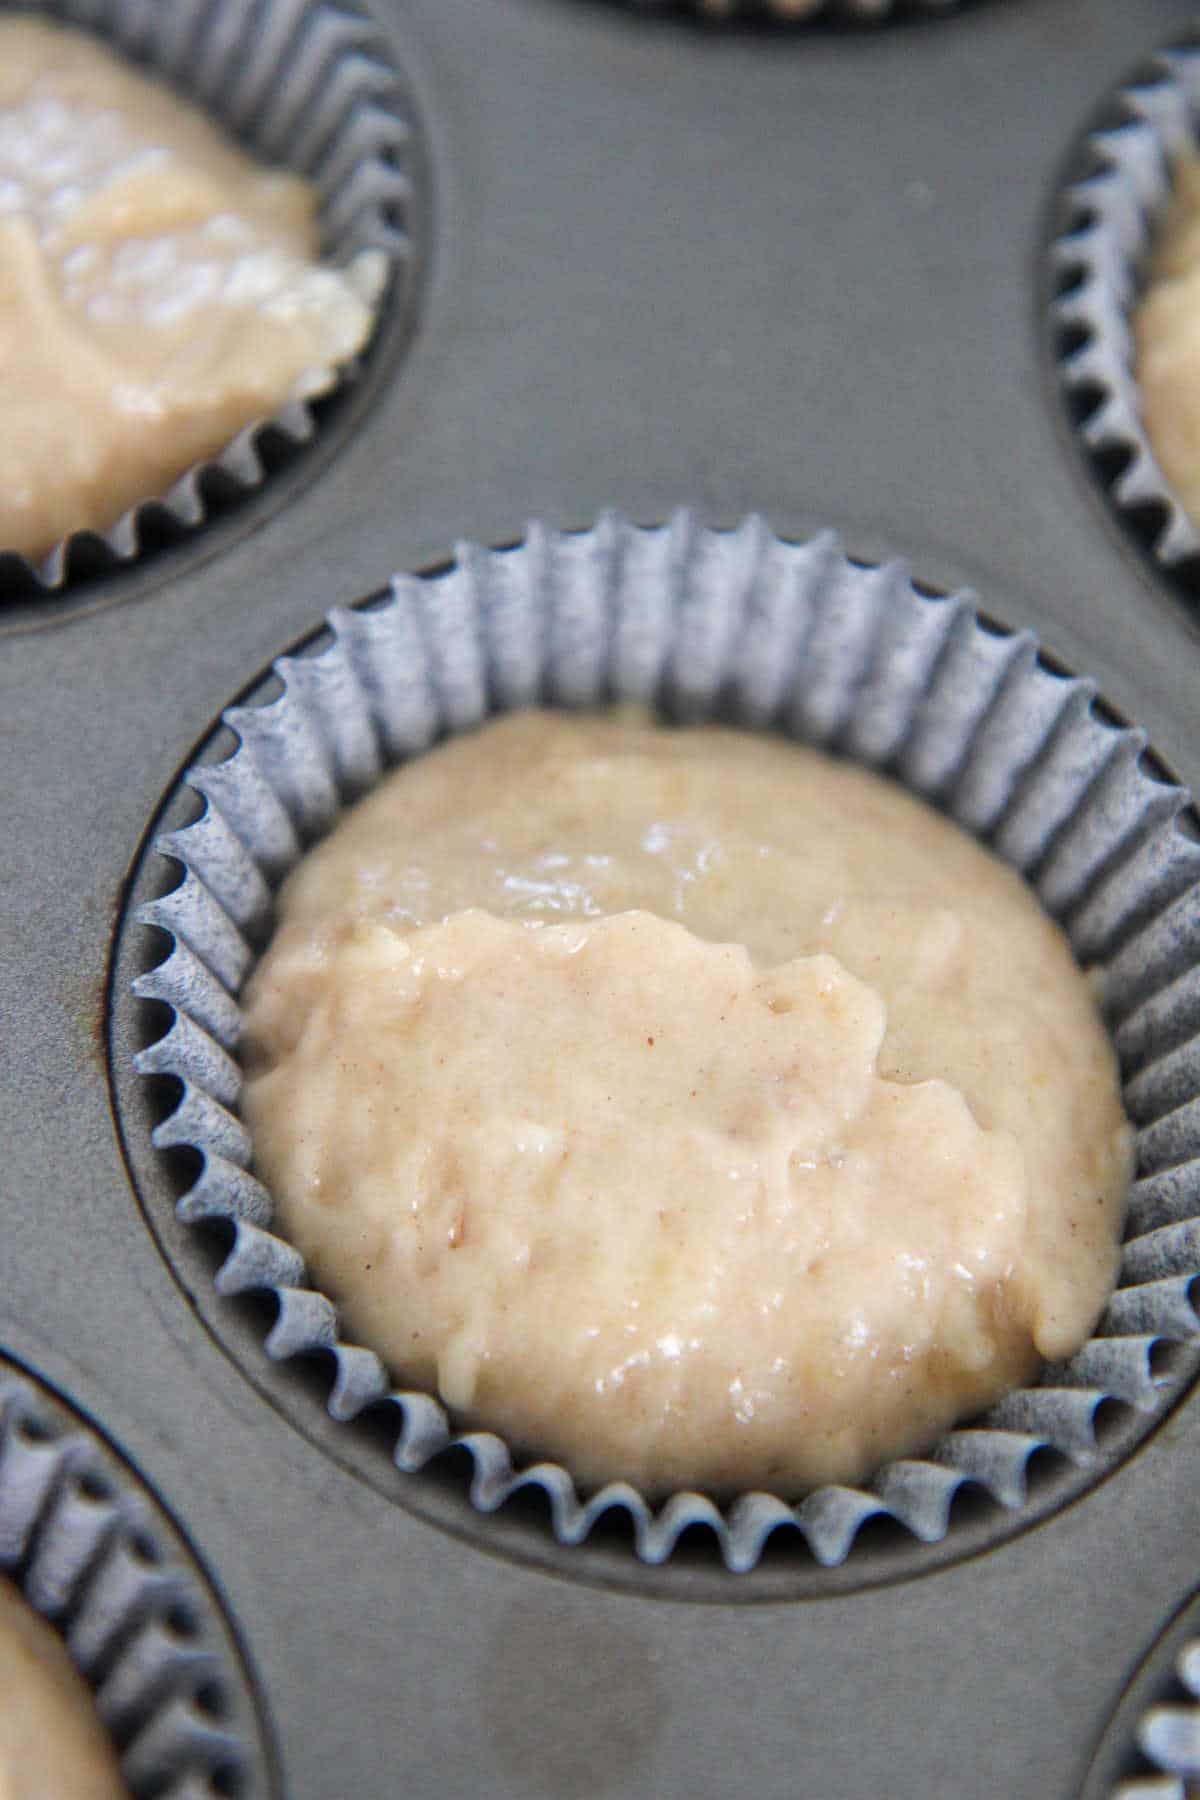 banana muffin batter in a cupcake liner